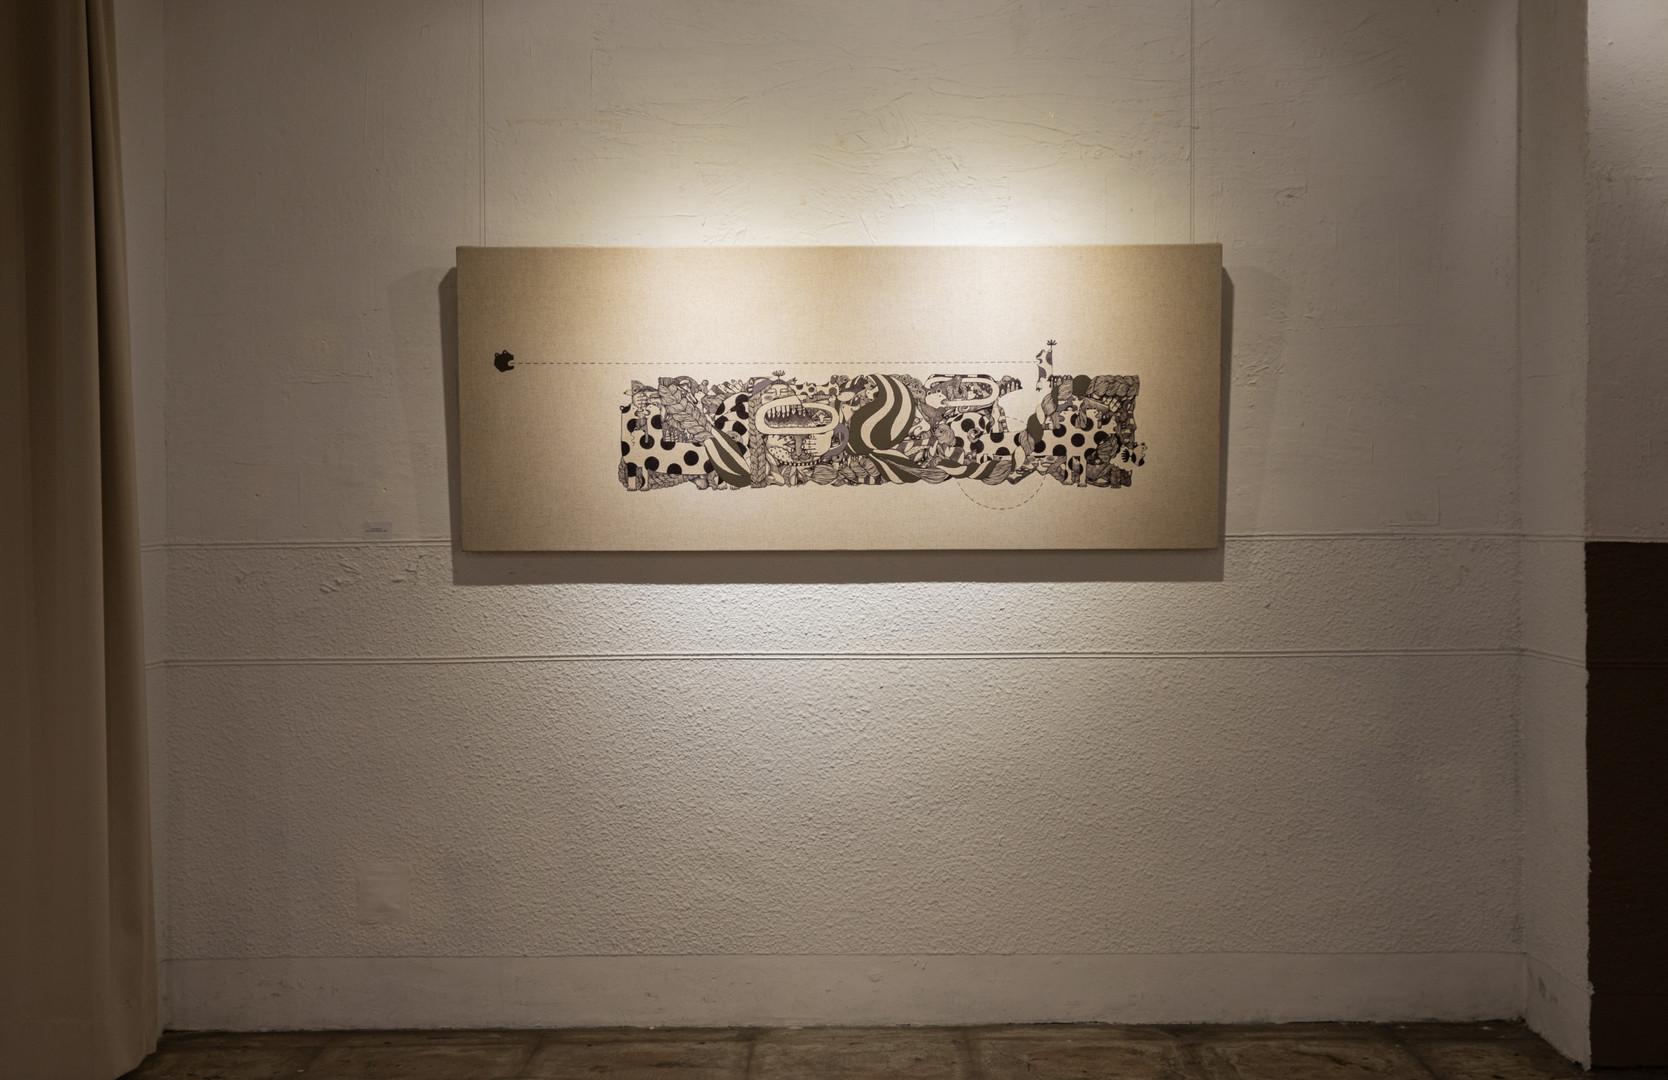 Exhibition View 8